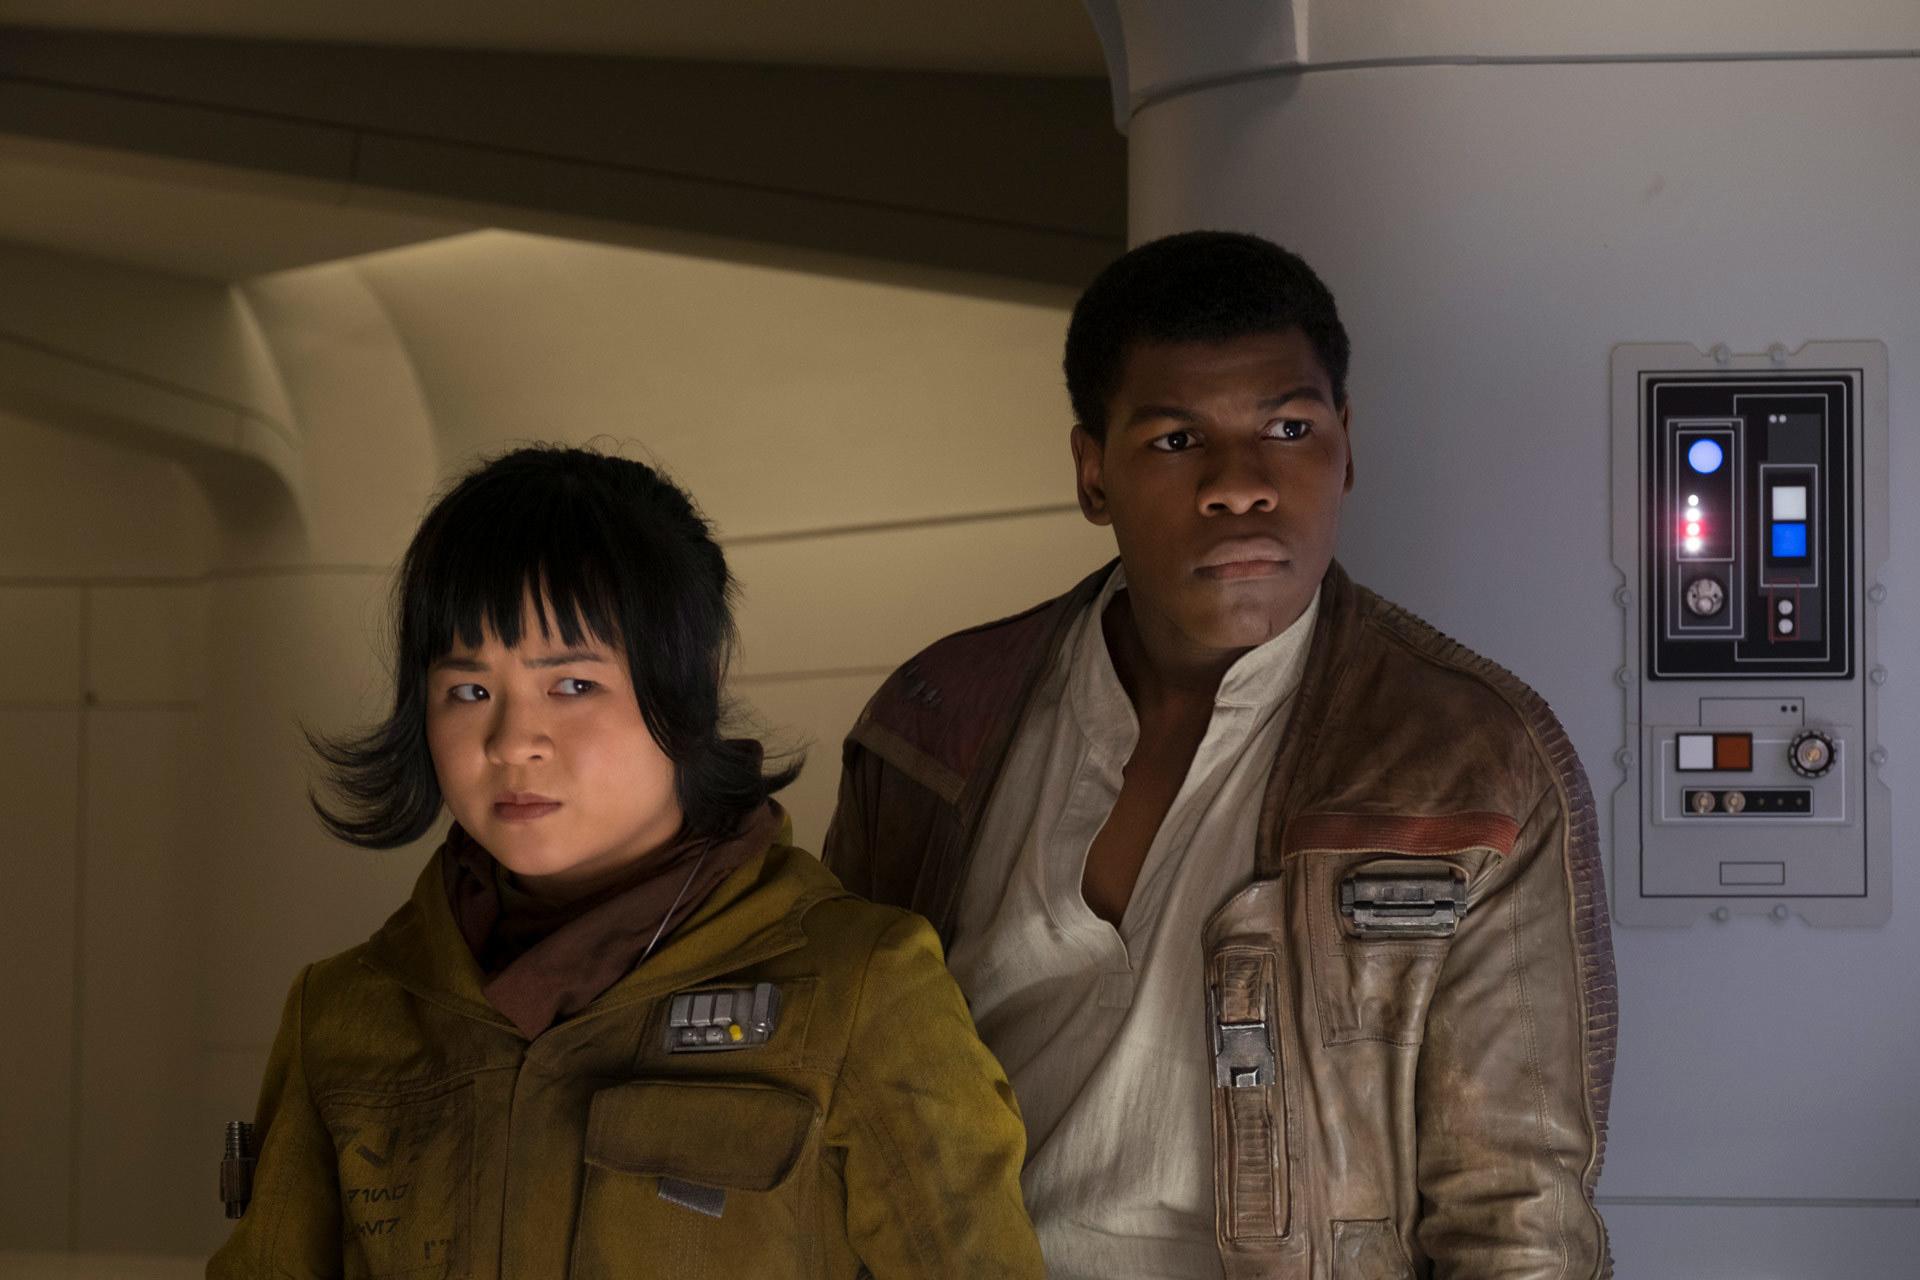 Image: Kelly Marie Tran and John Boyega in Stars Wars: The Last Jedi